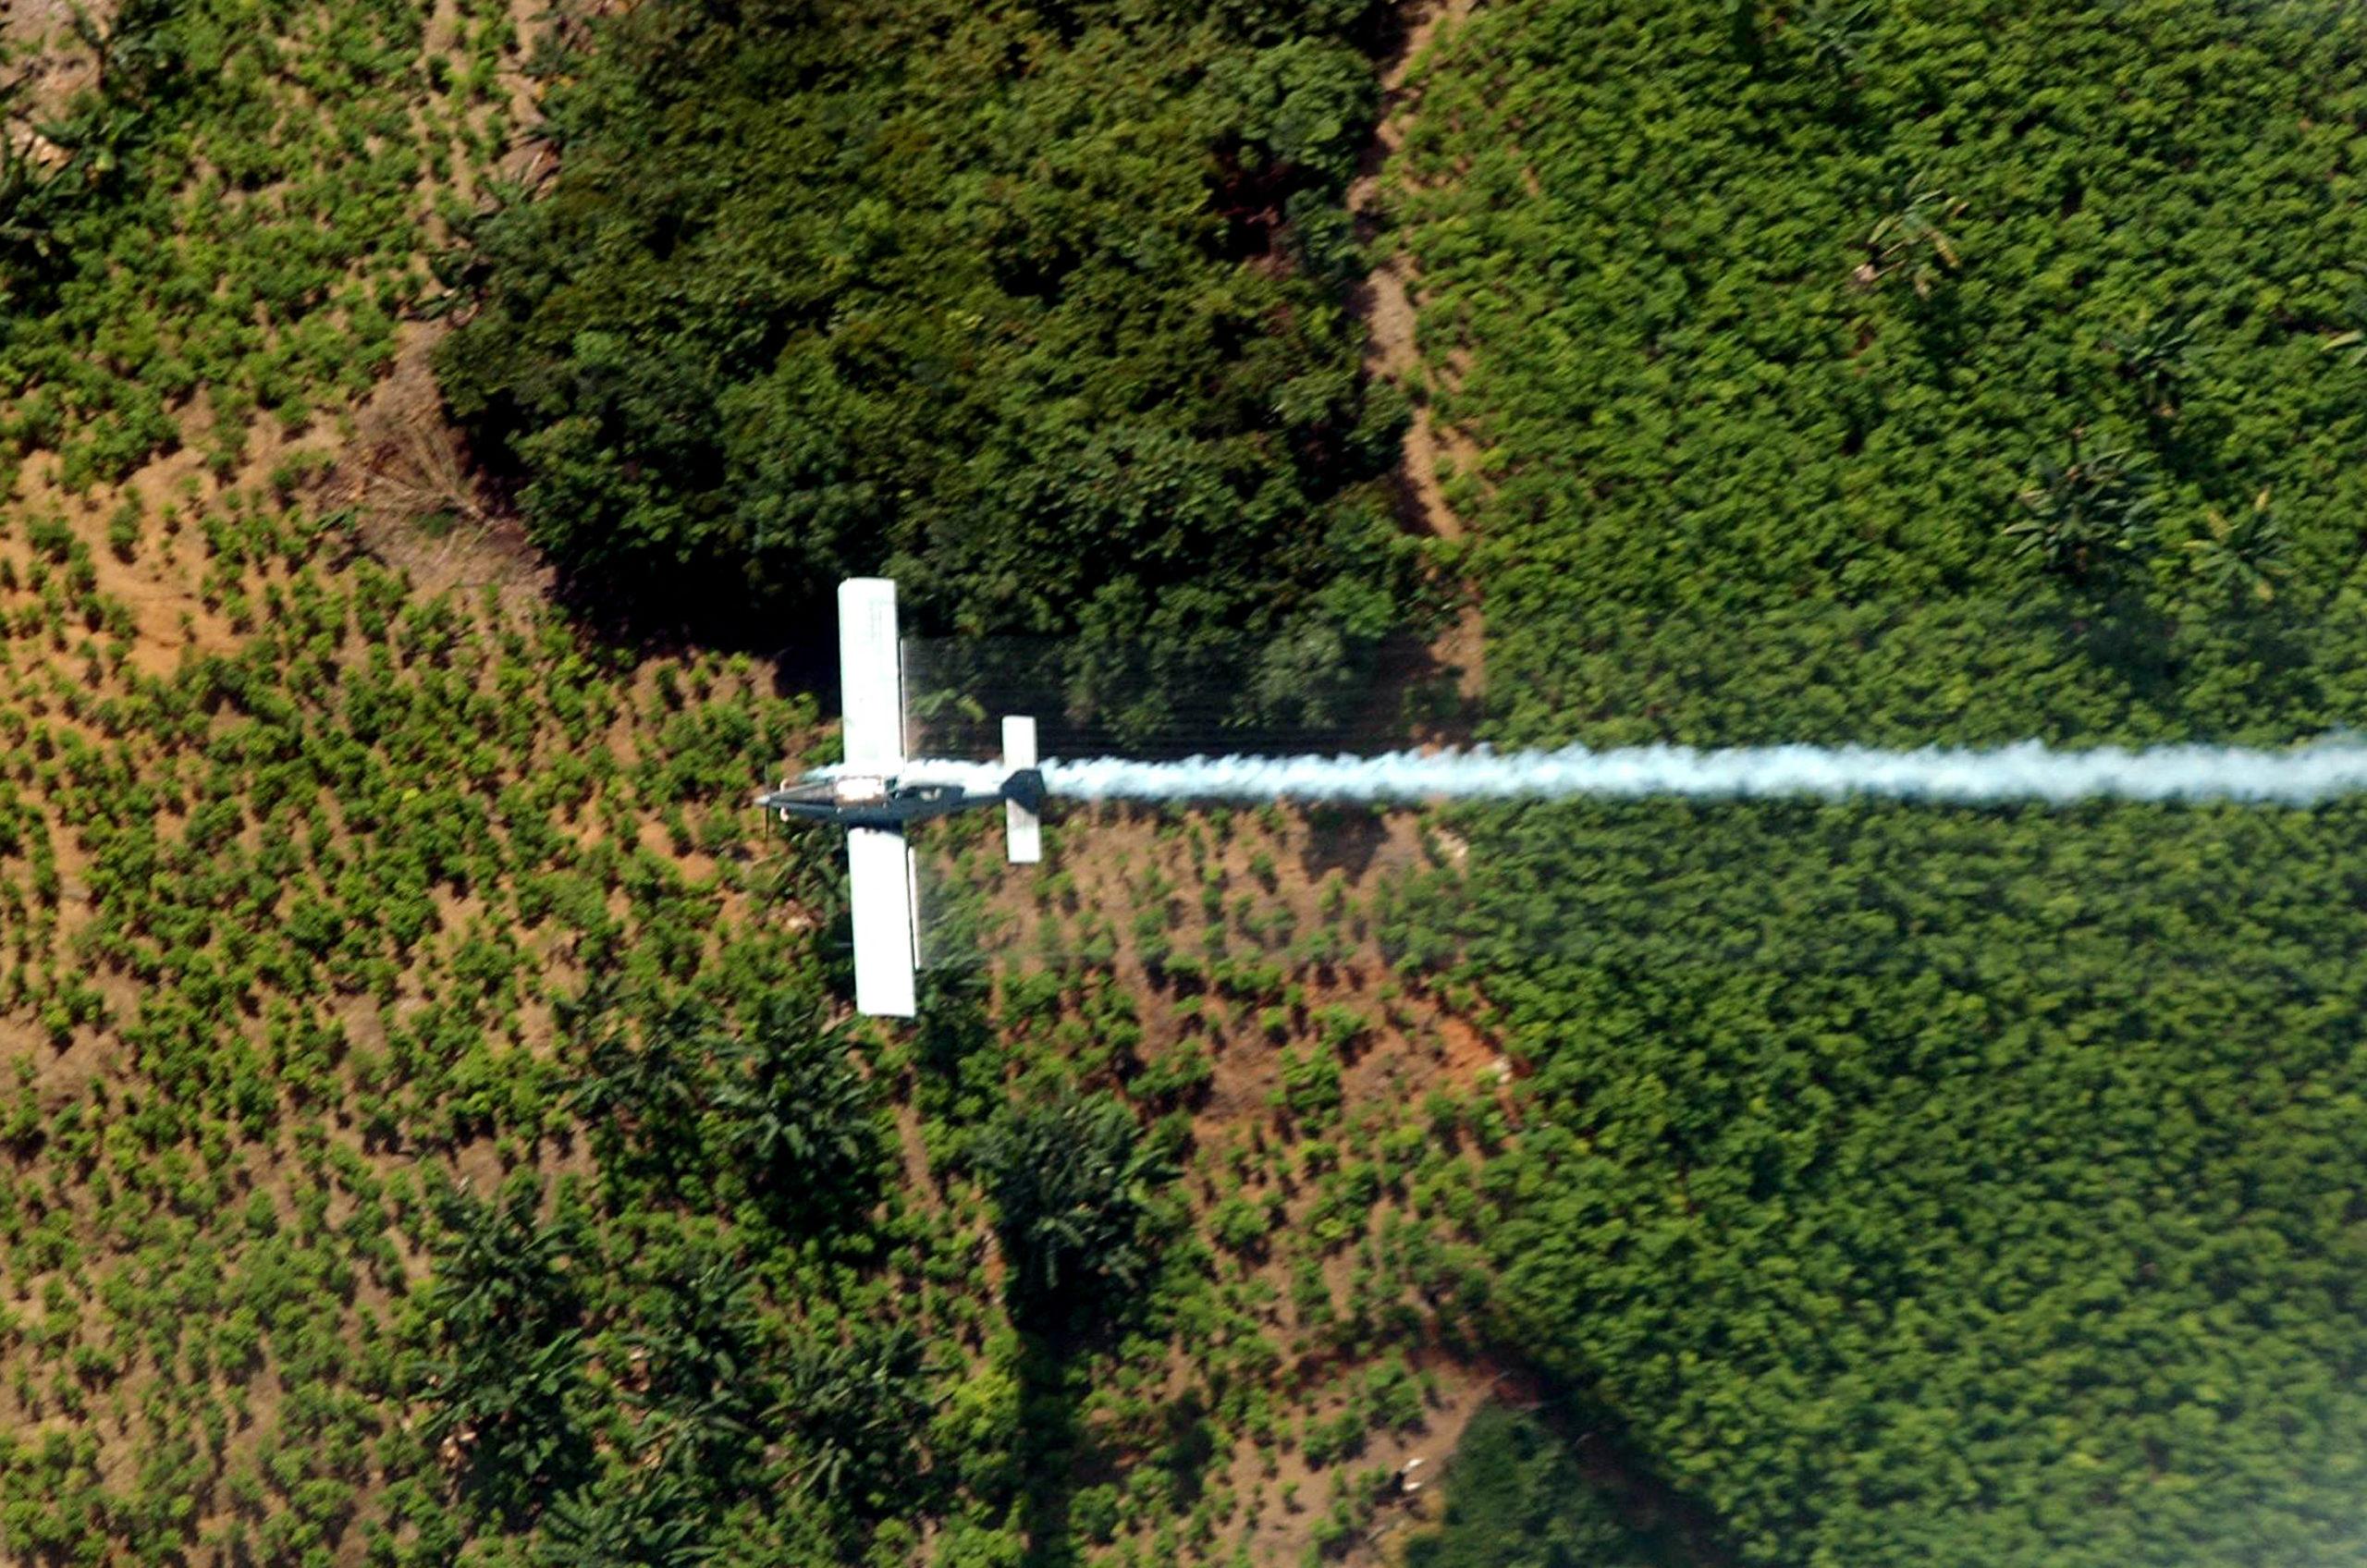 Colombia-Venezuela Border has the Largest Concentration of Coca Crops